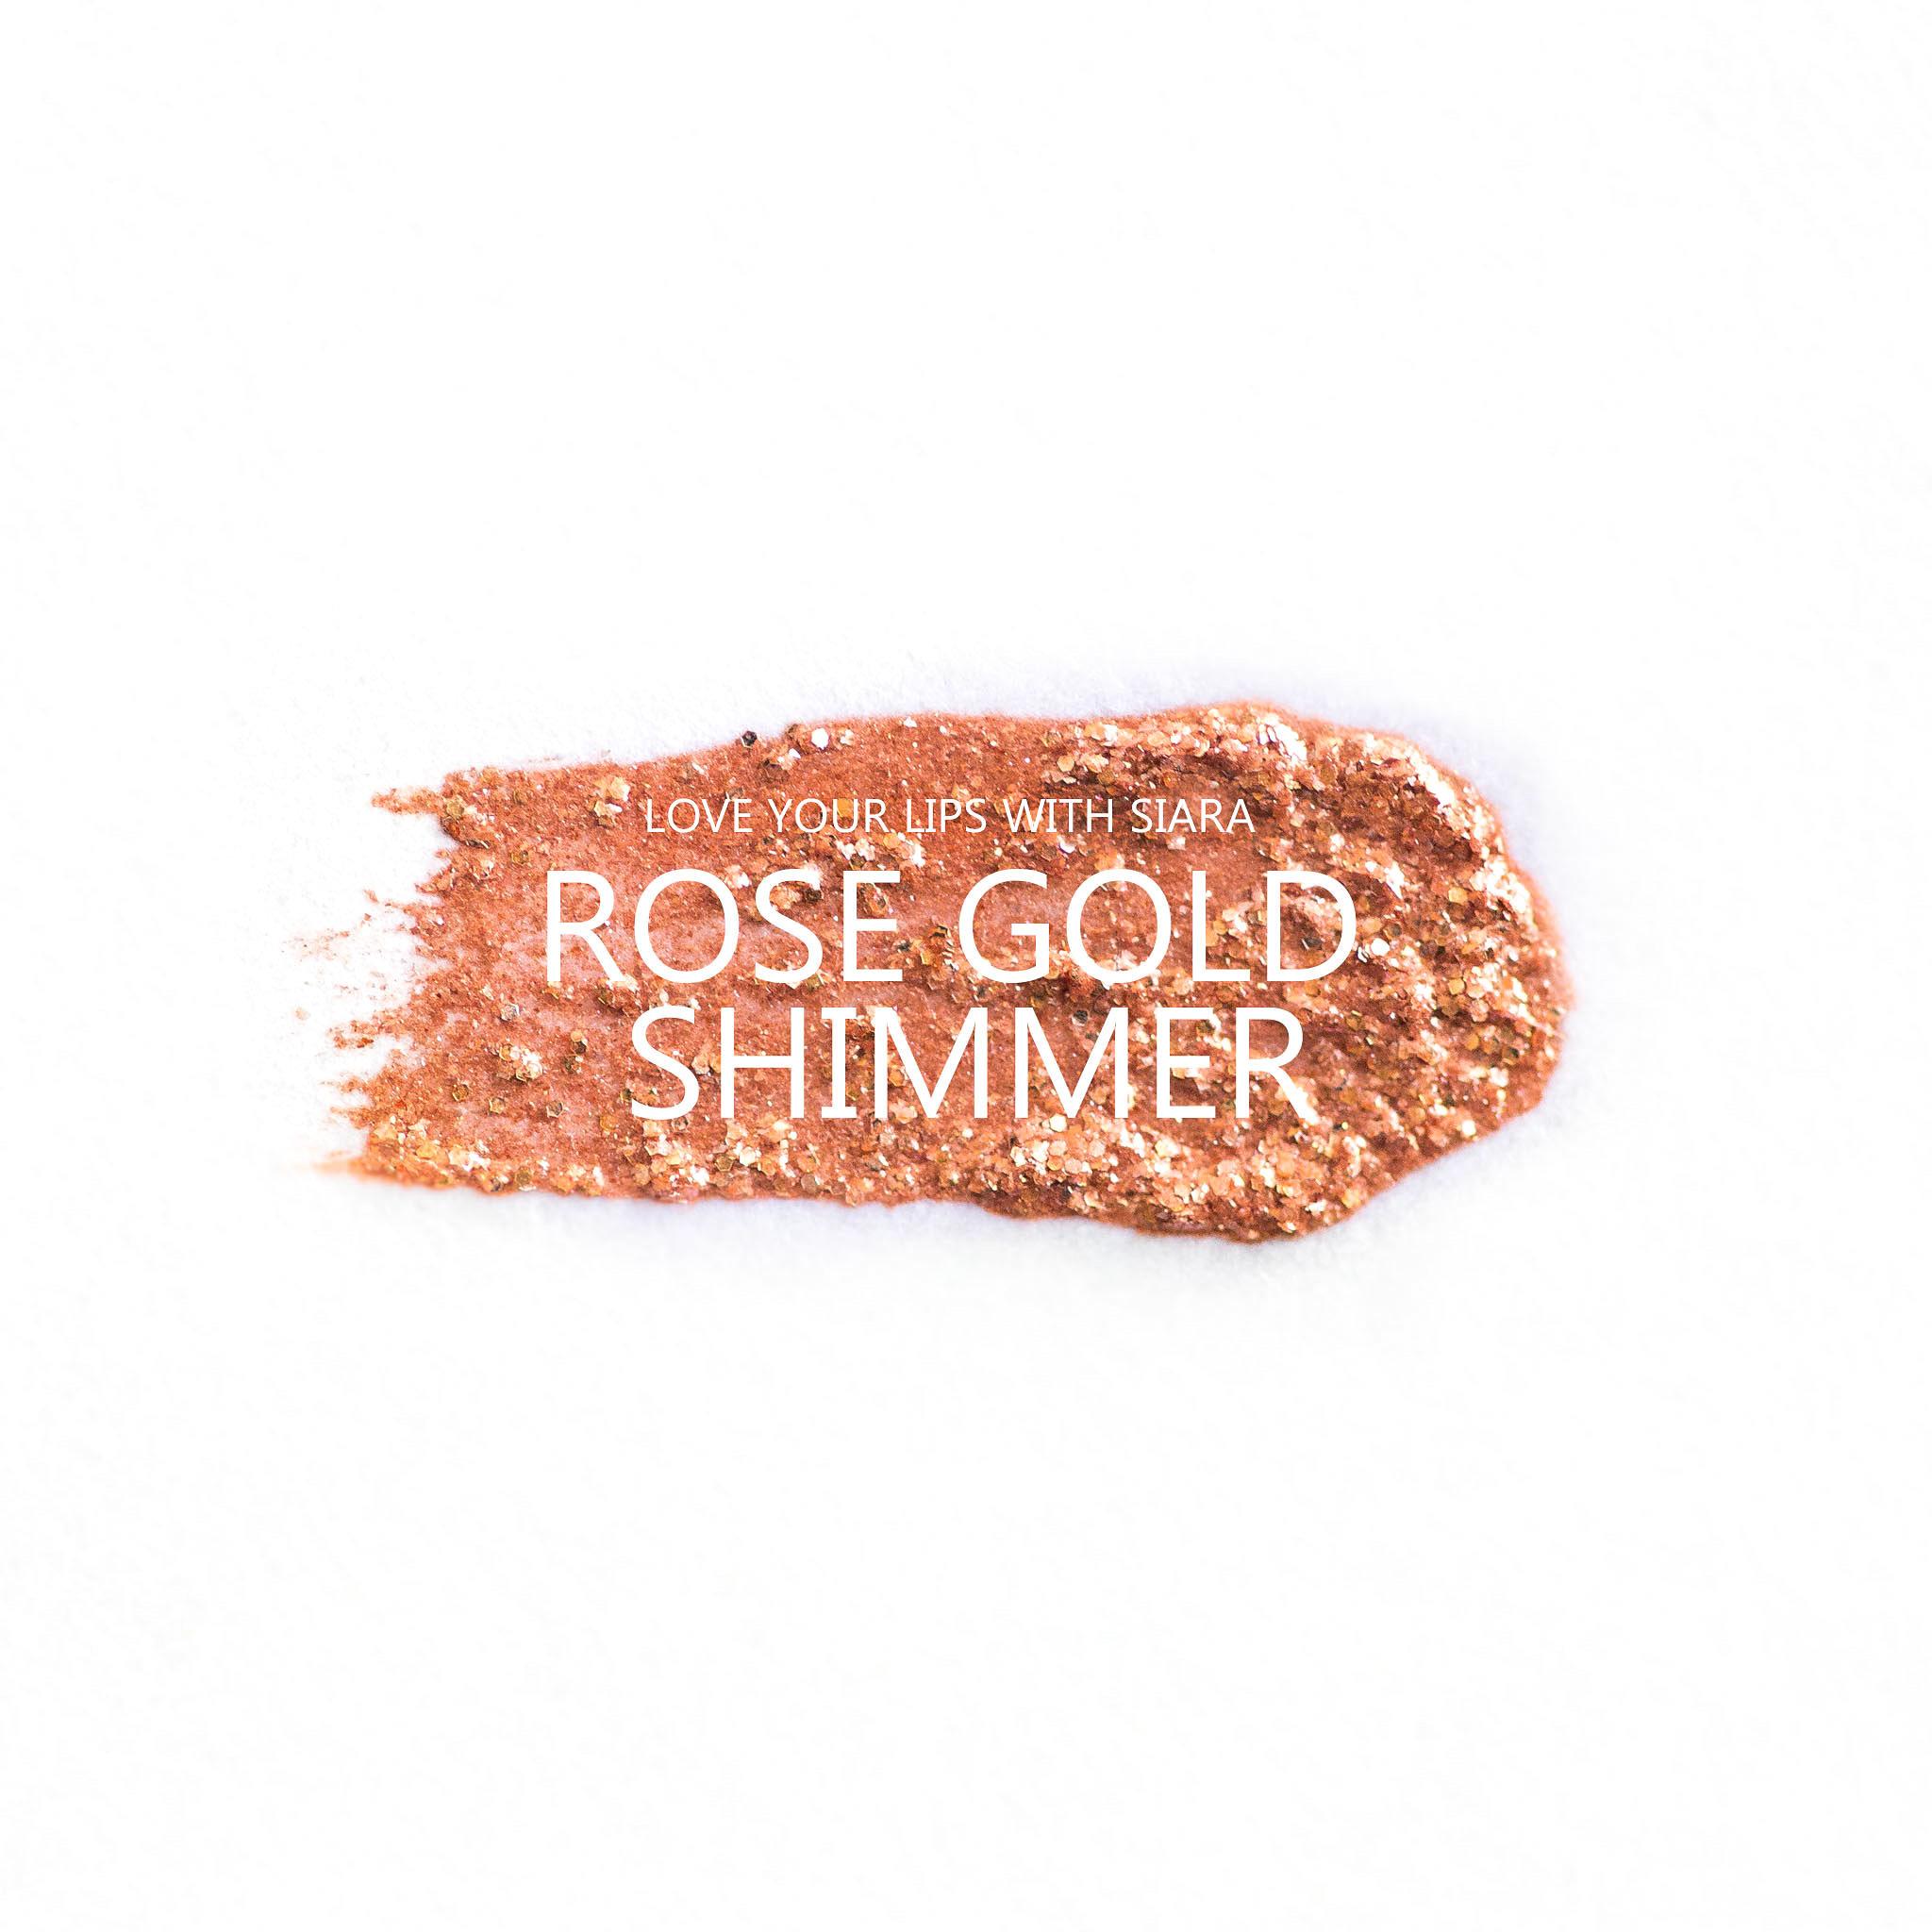 Rose Gold Shimmer ShadowSense